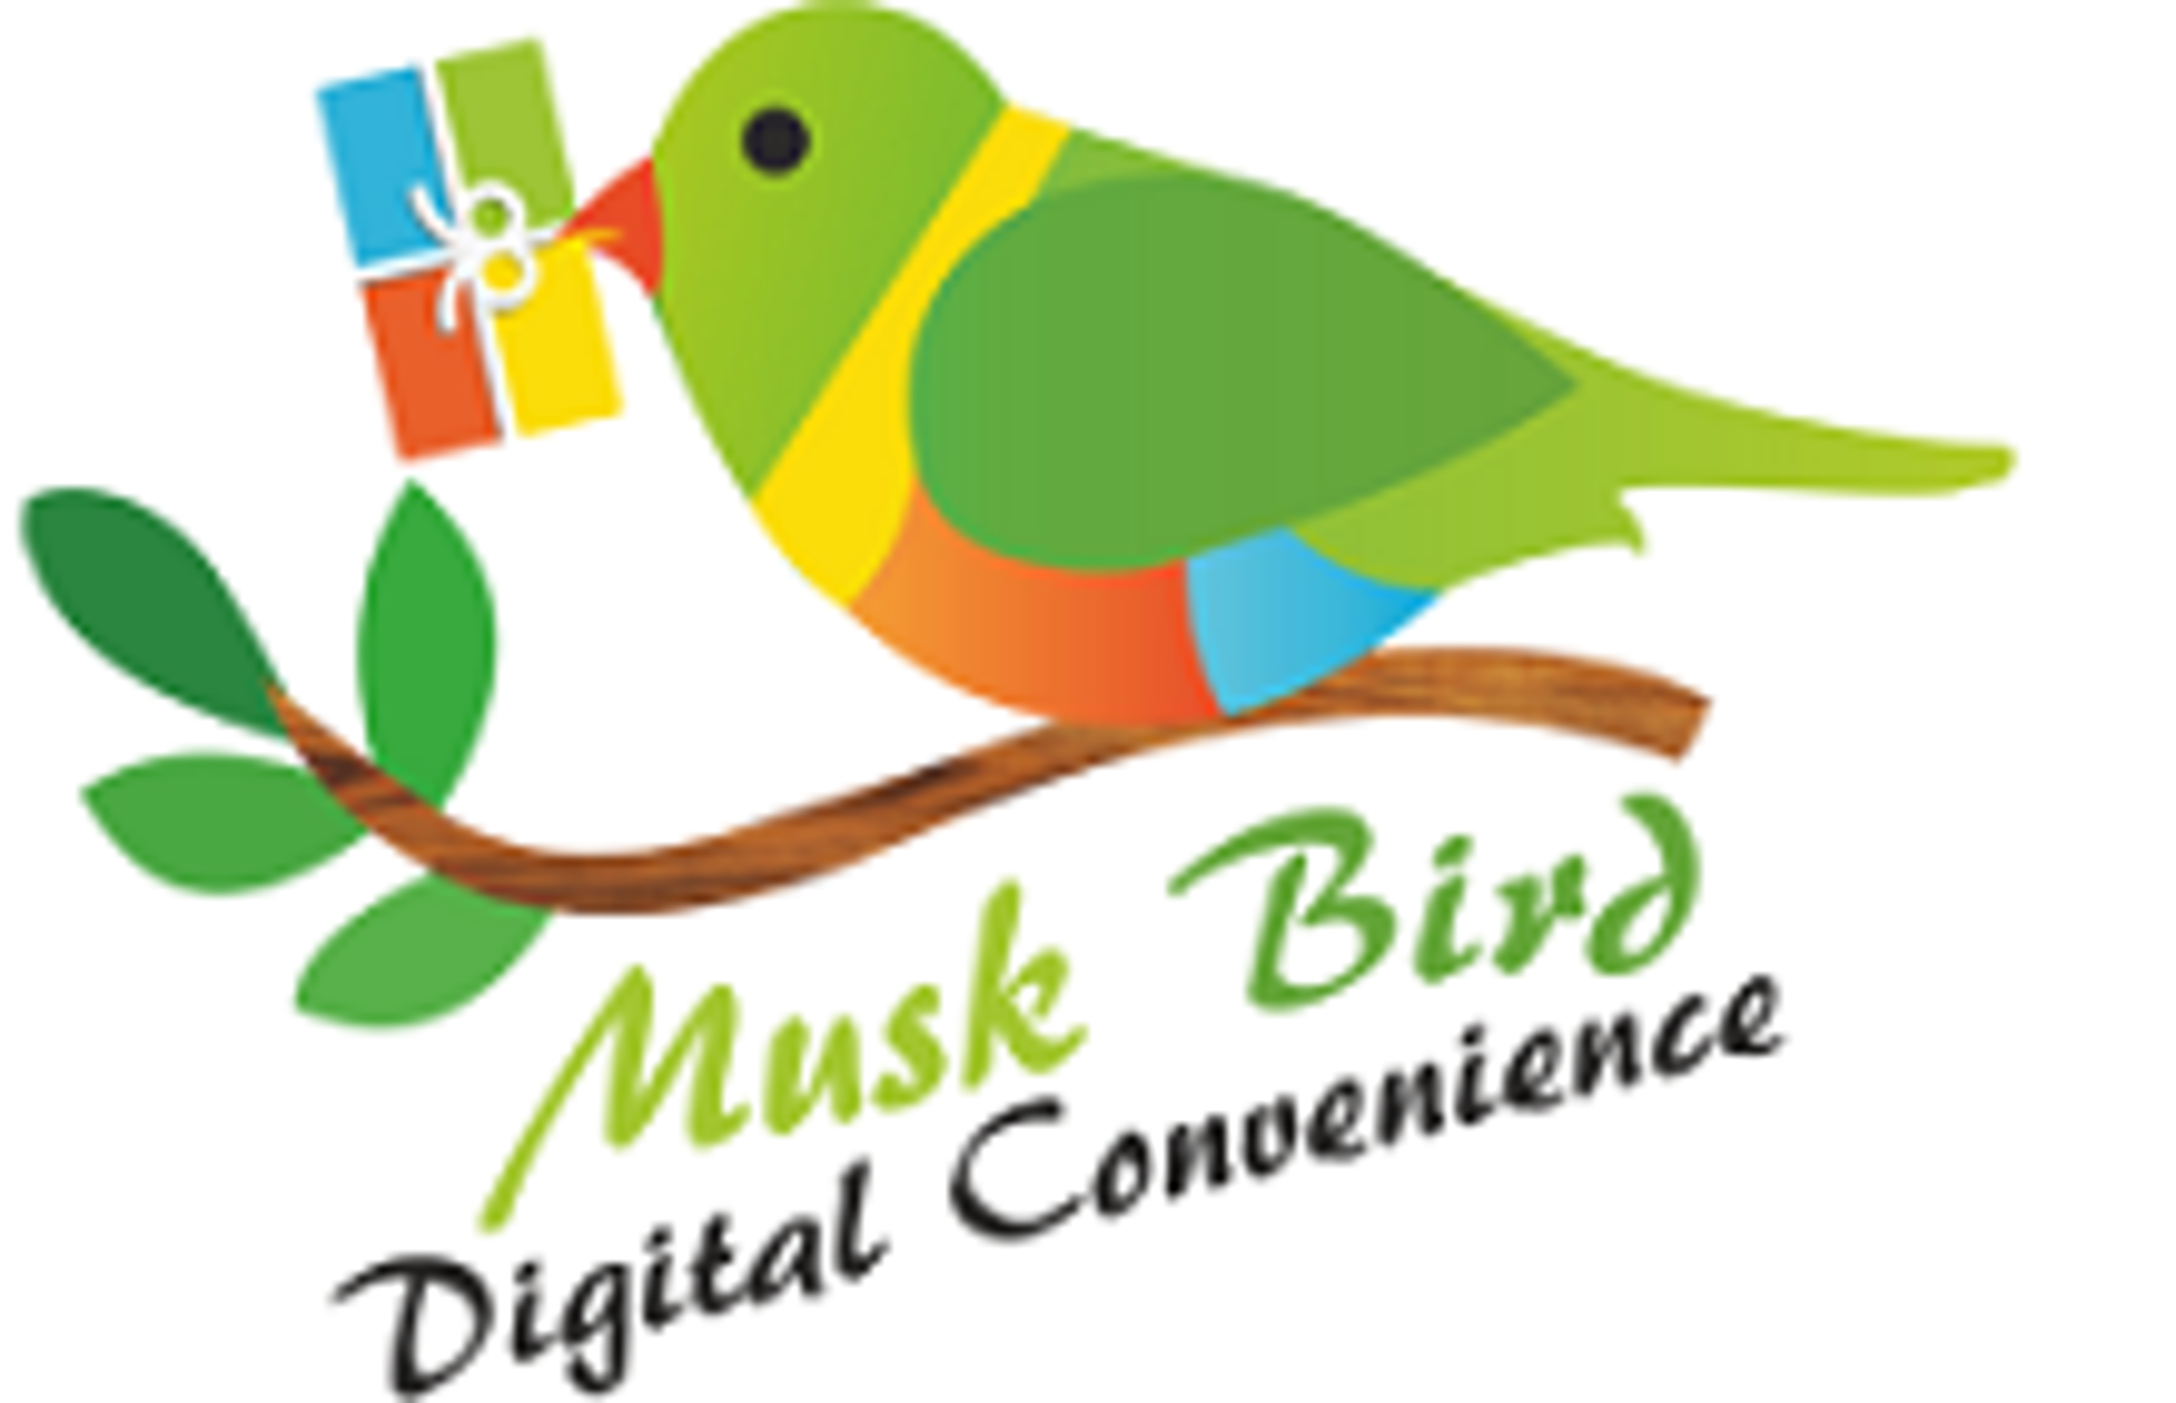 muskbird.com